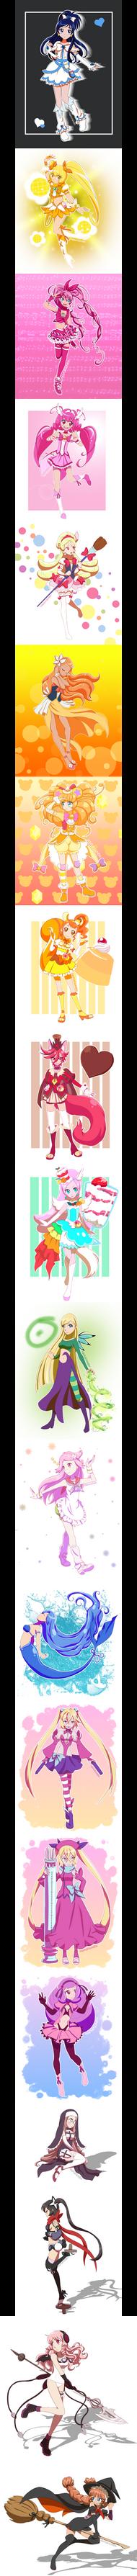 Magical girls 7